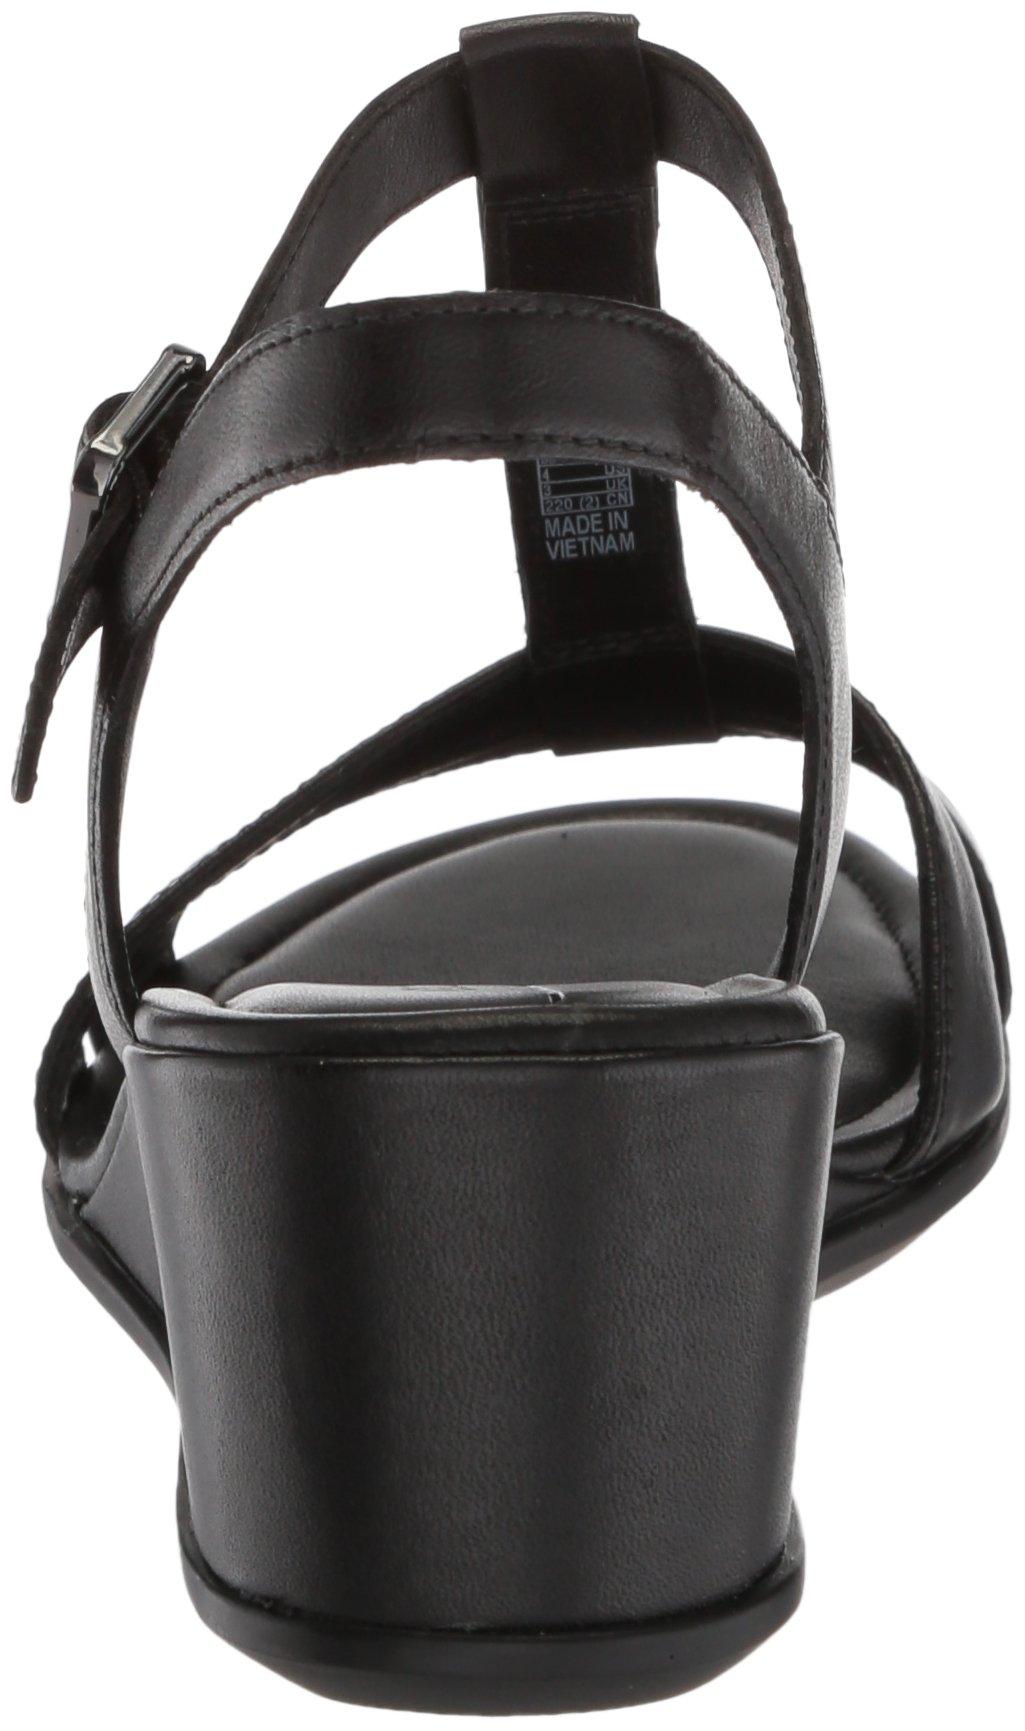 ECCO Women's Women's Shape 35 T-Strap Wedge Sandal, Black/Black, 37 M EU (6-6.5 US) by ECCO (Image #2)